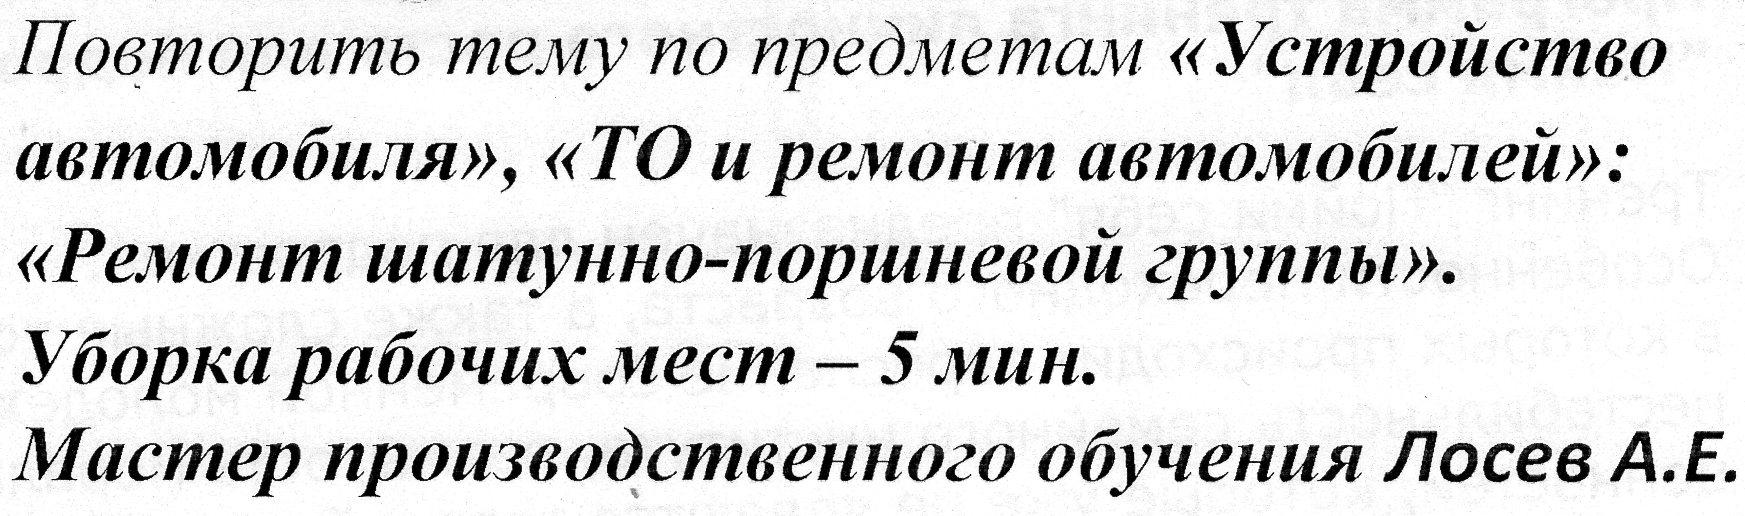 C:\Users\Василий Мельченко\Pictures\img582.jpg